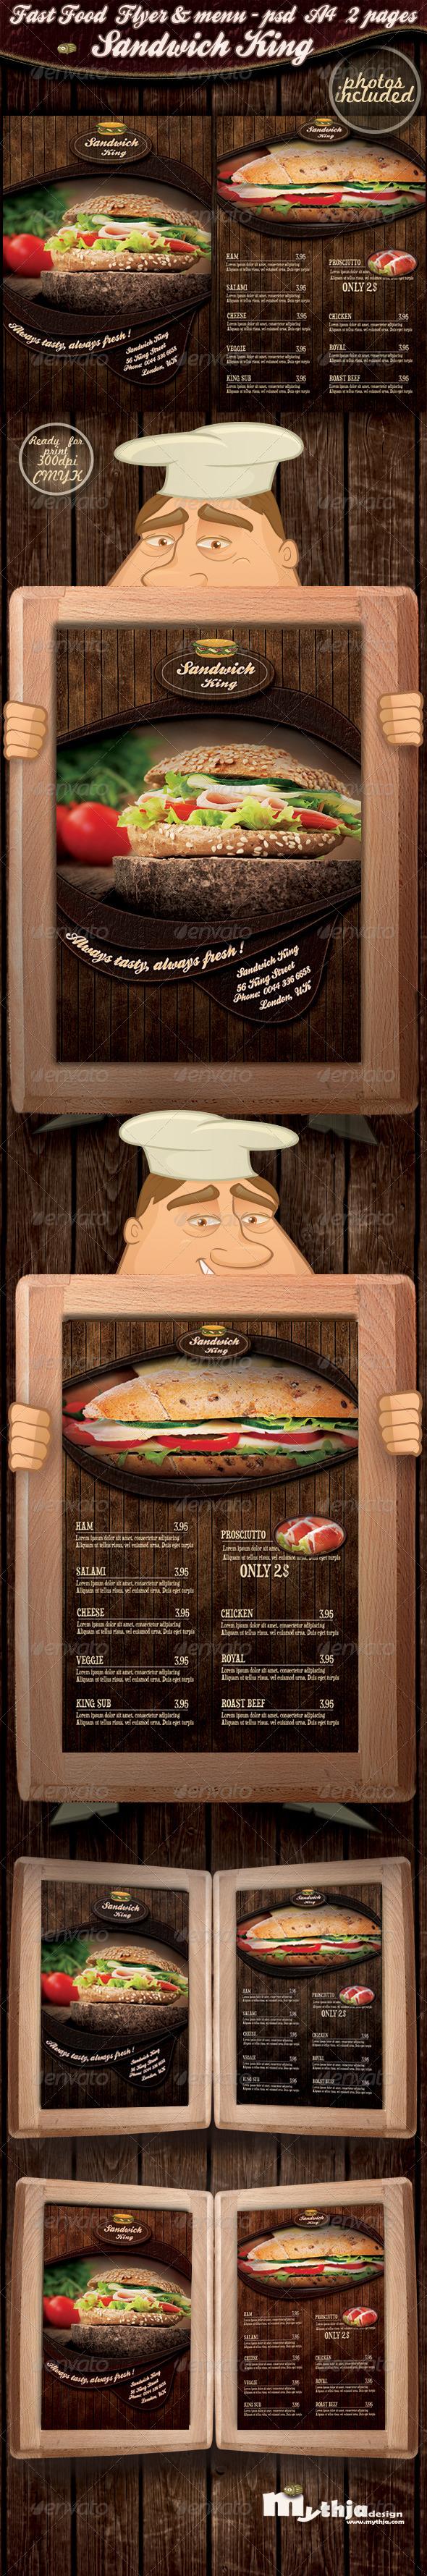 Fast food flyer & menu - Sandwich king